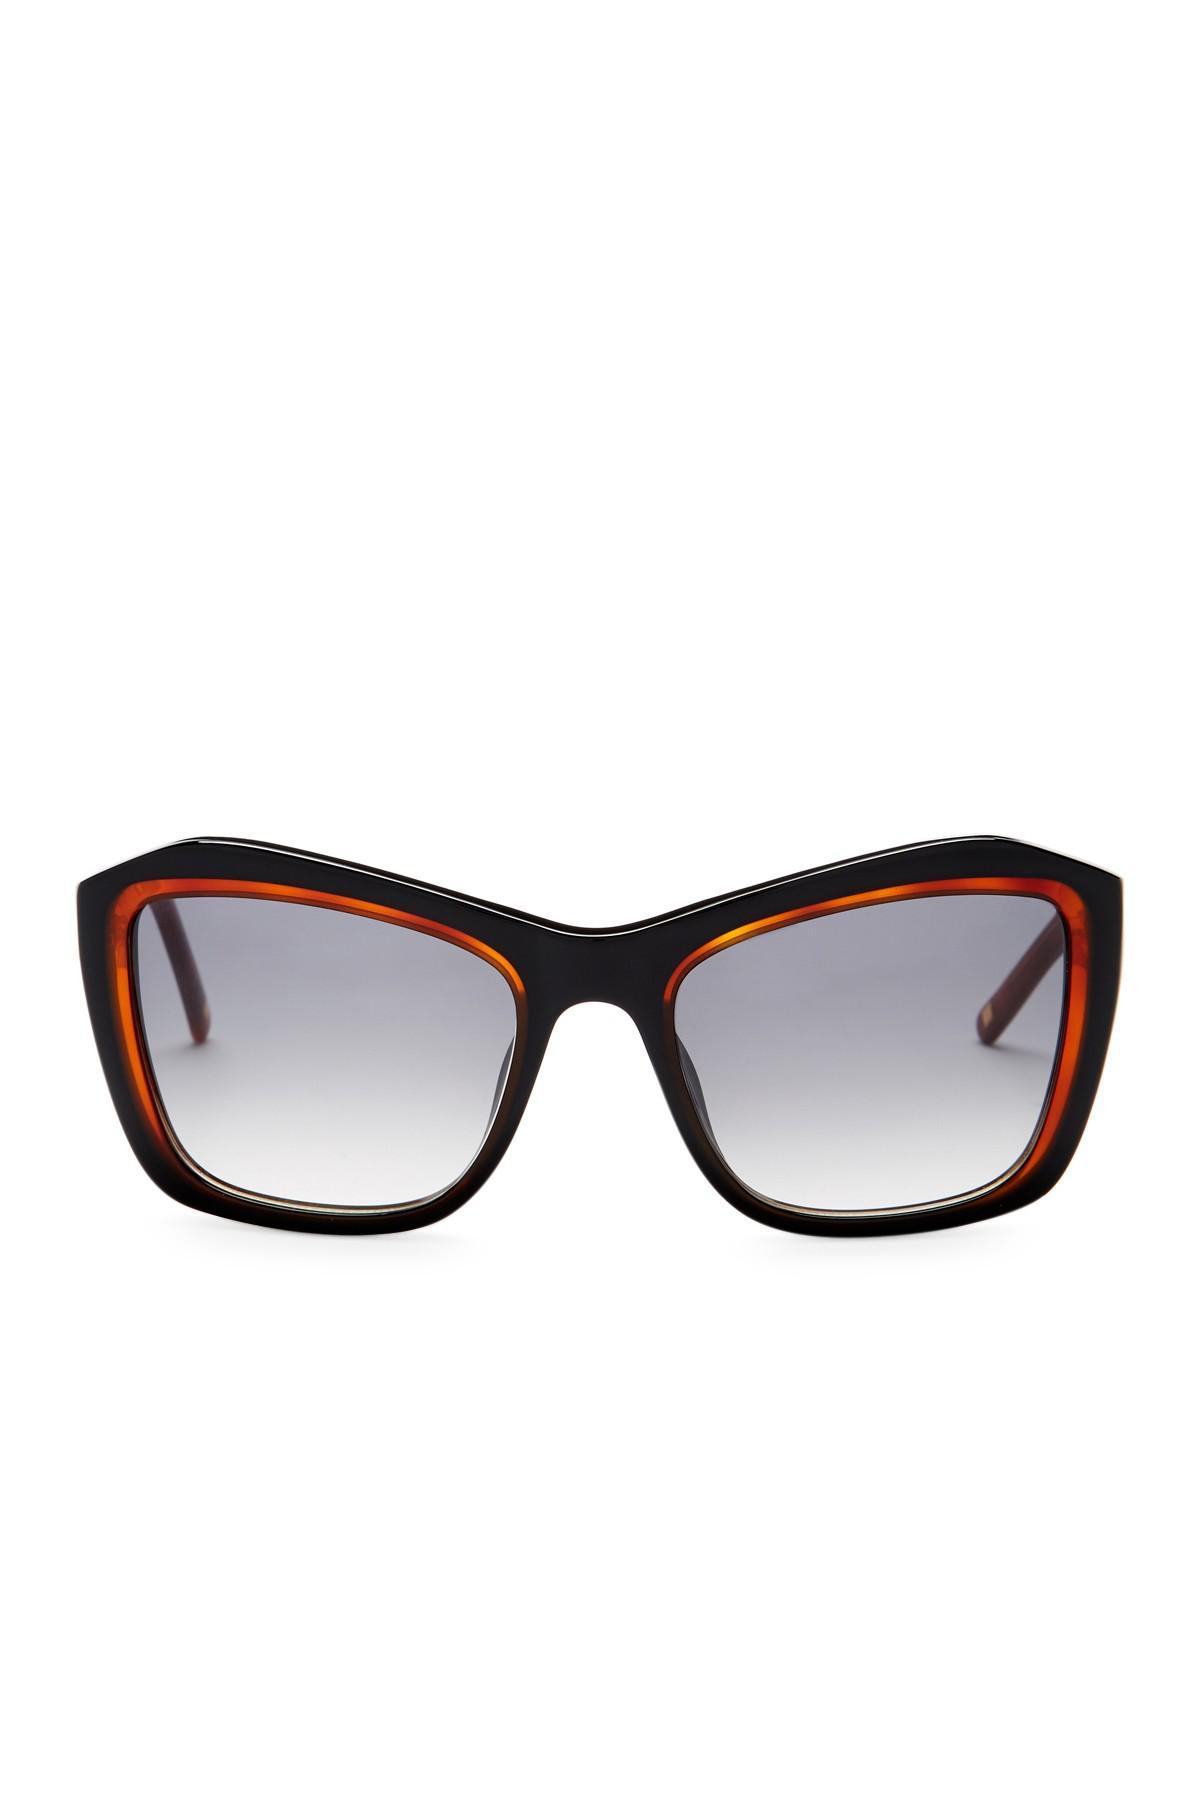 6d86402377 Lyst - Escada Women s Oversized Sunglasses in Brown